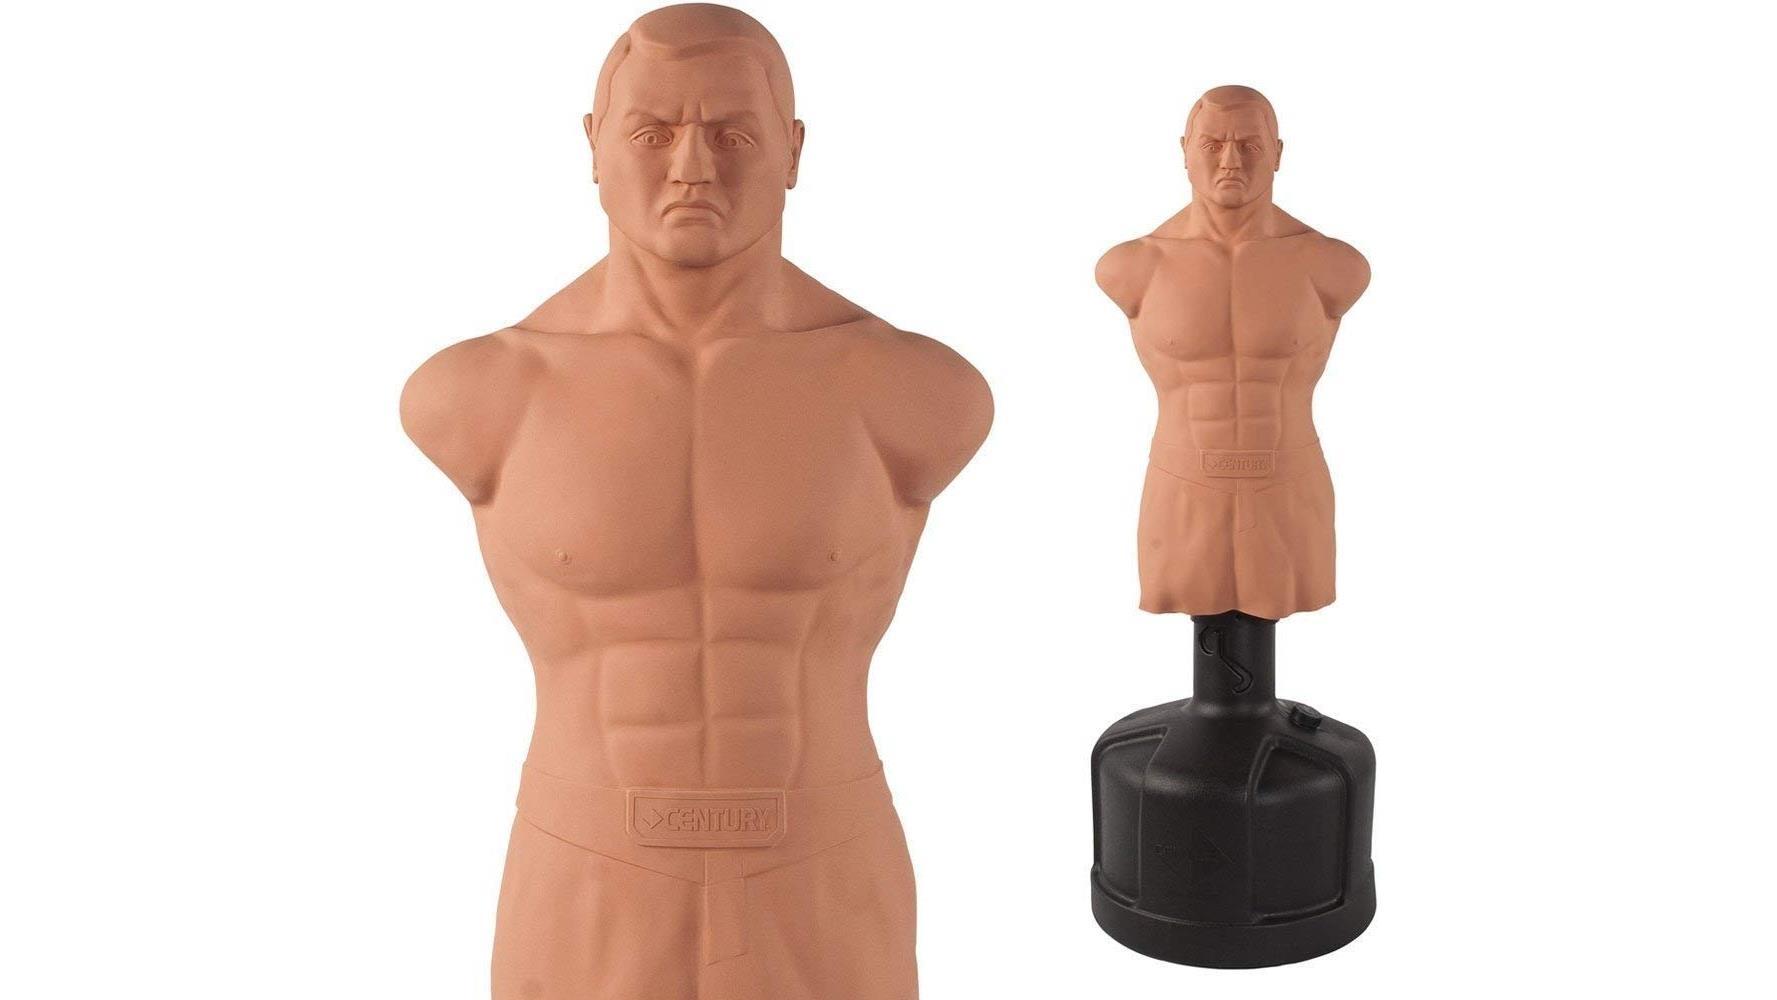 Best Home Gym Equipment Bob 16x9